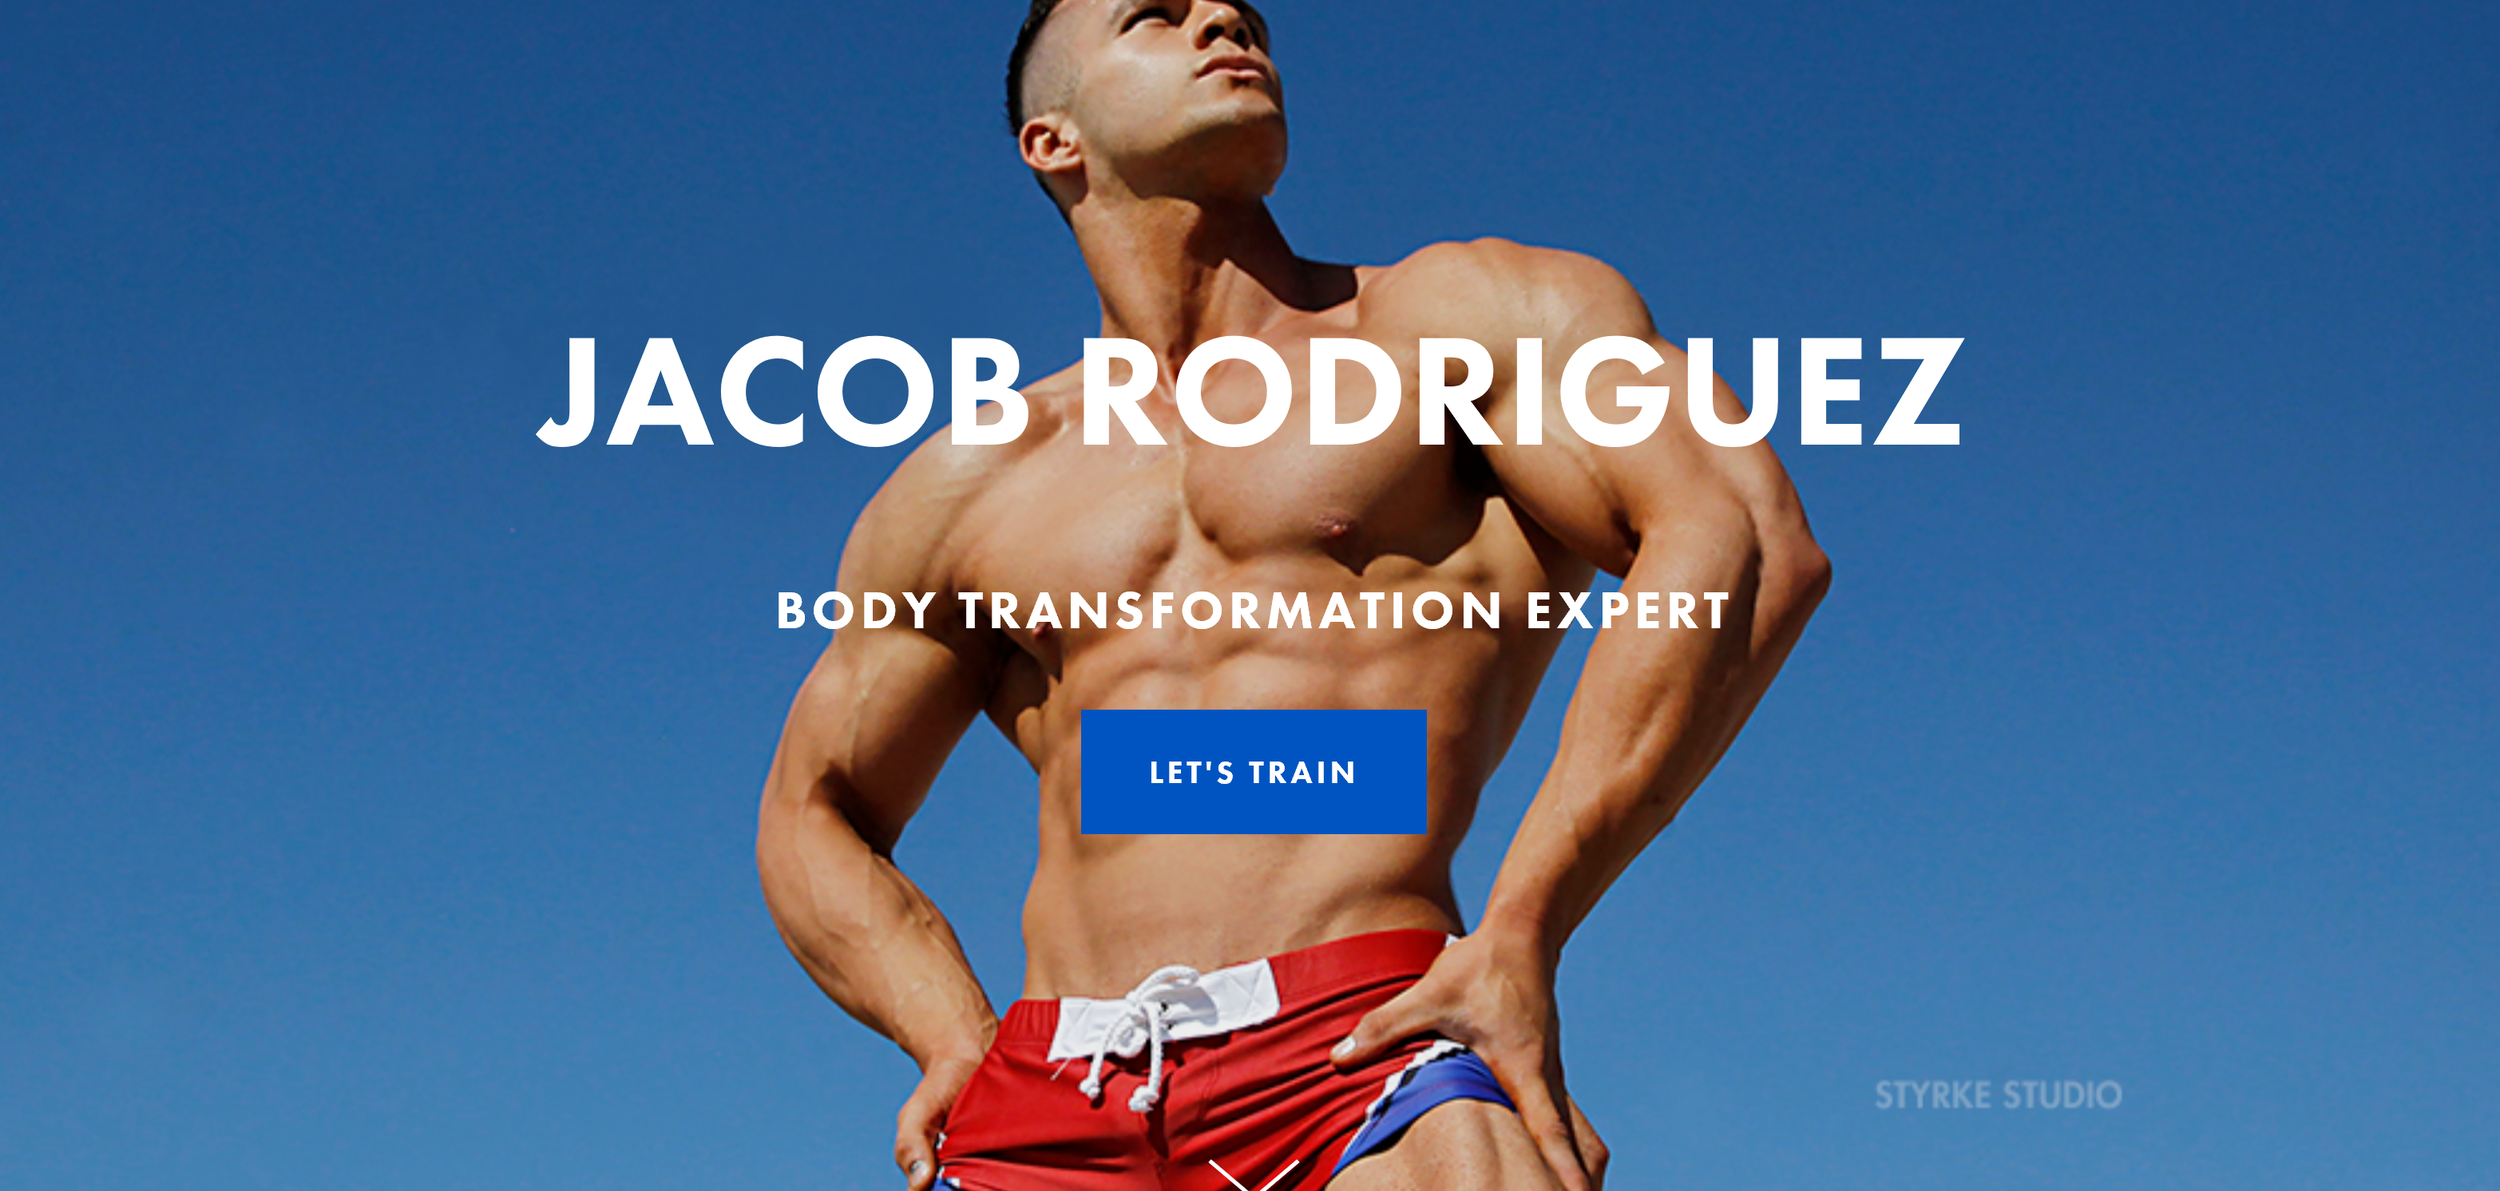 Jacob Rodriguez Fitness Kristen Lem Web Design 1.png